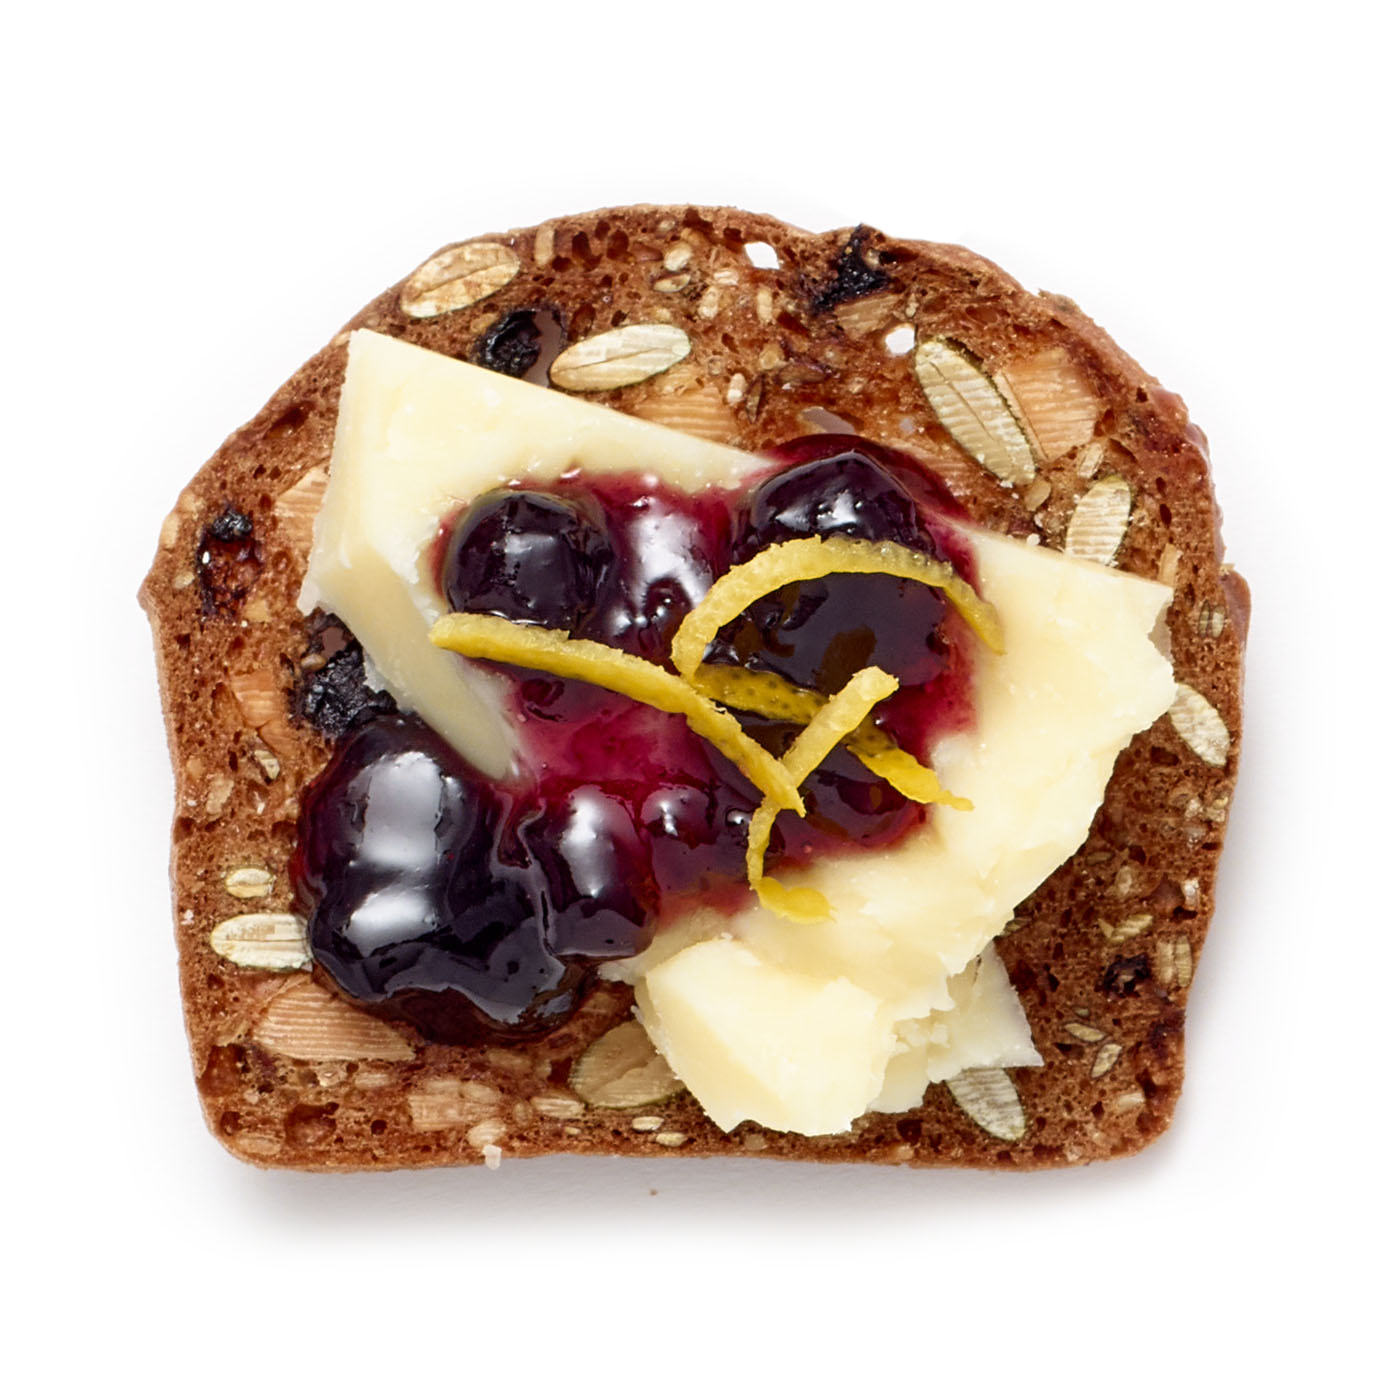 lesley stowe raincoast crisps® wild blueberry and almond